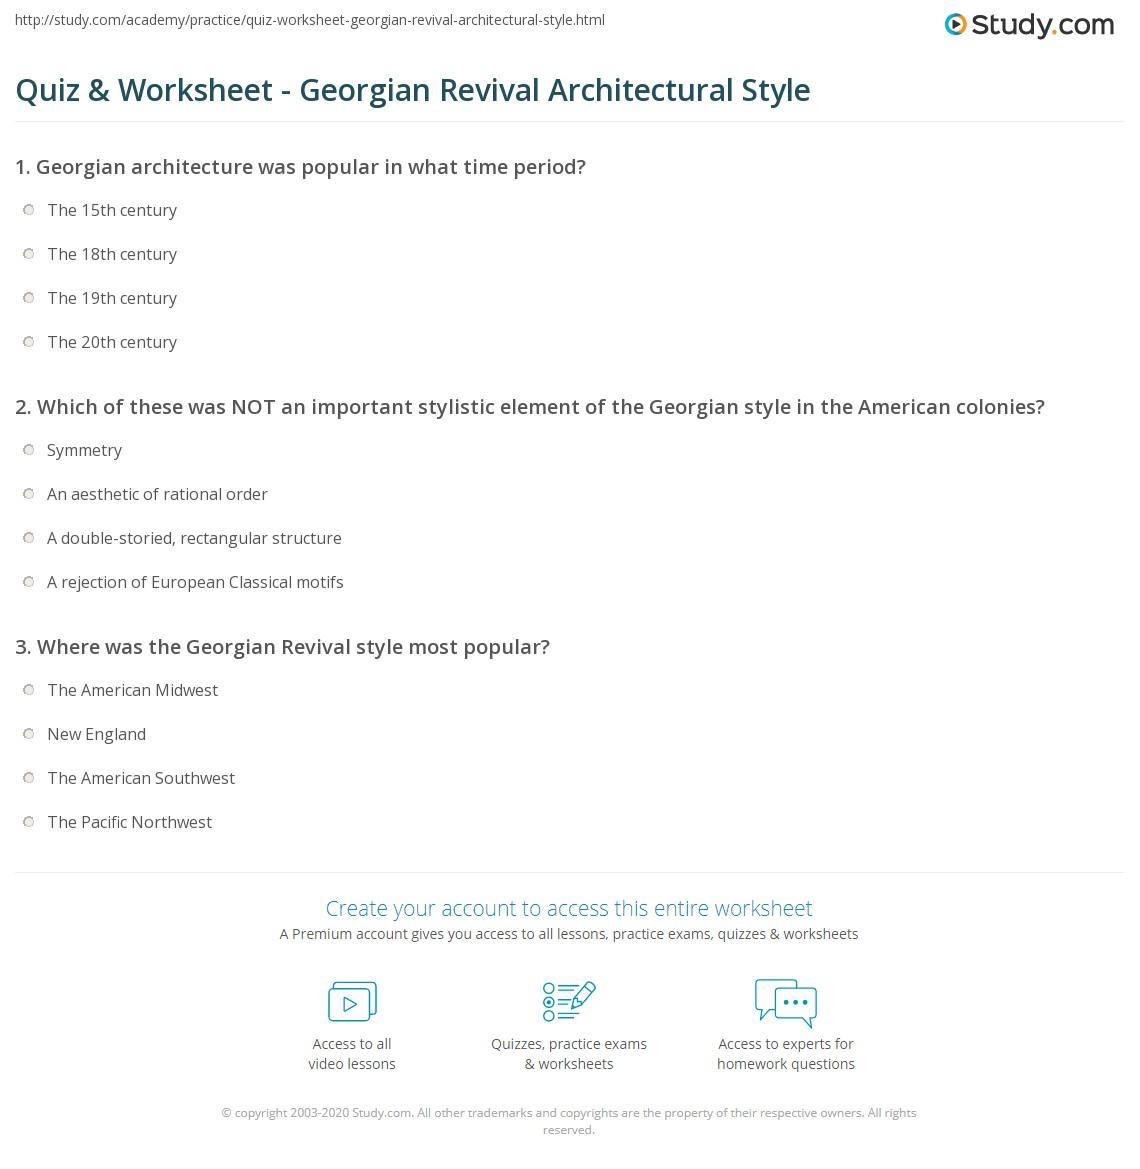 quiz worksheet georgian revival architectural style study com